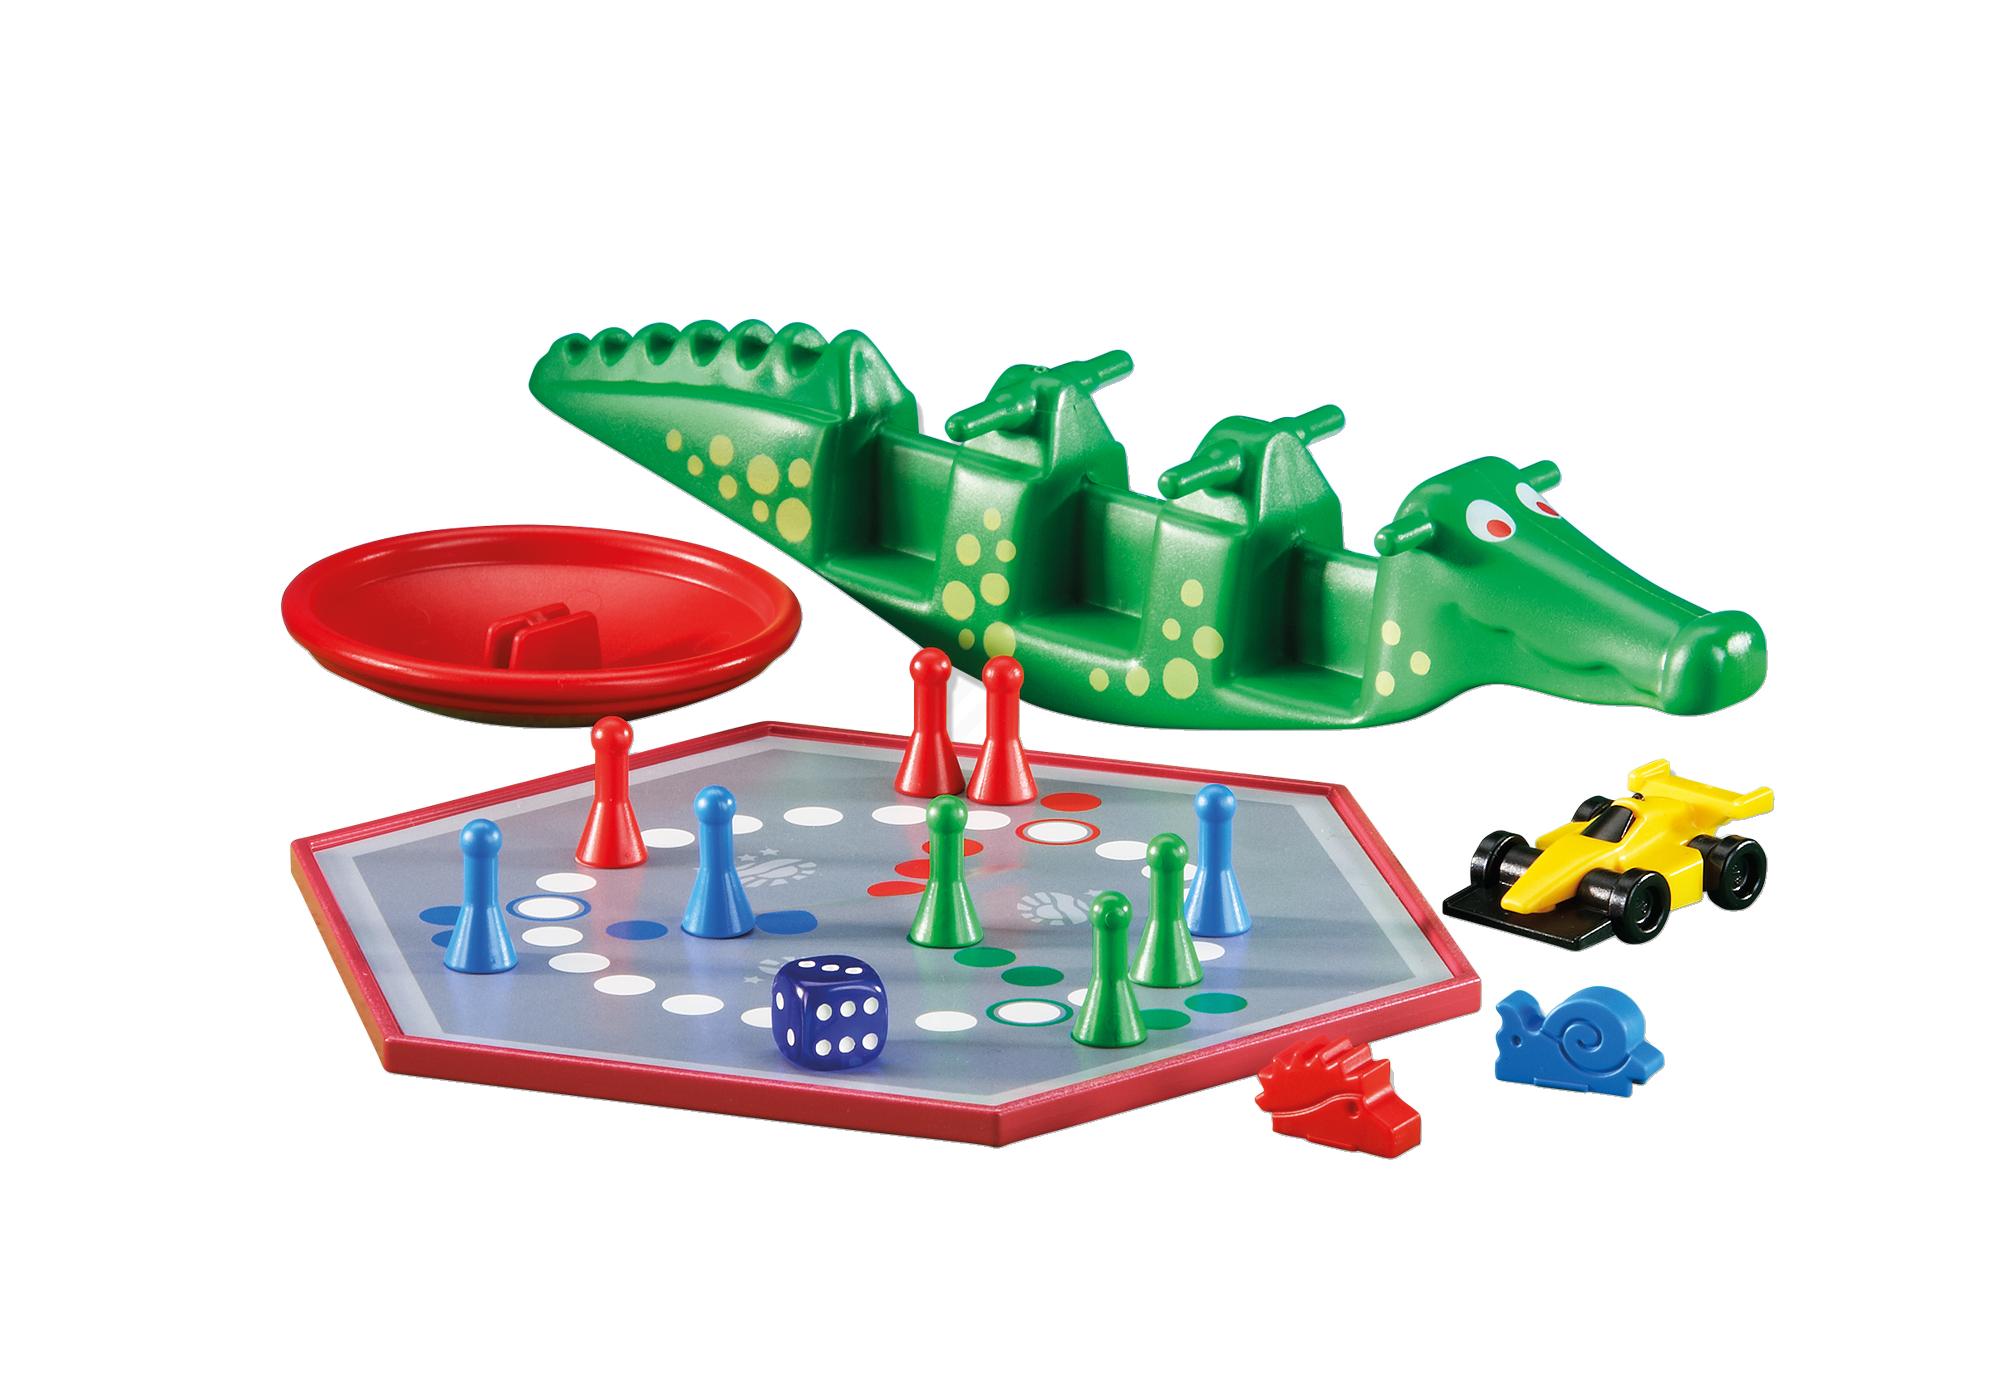 http://media.playmobil.com/i/playmobil/6391_product_detail/Kinderspielecke